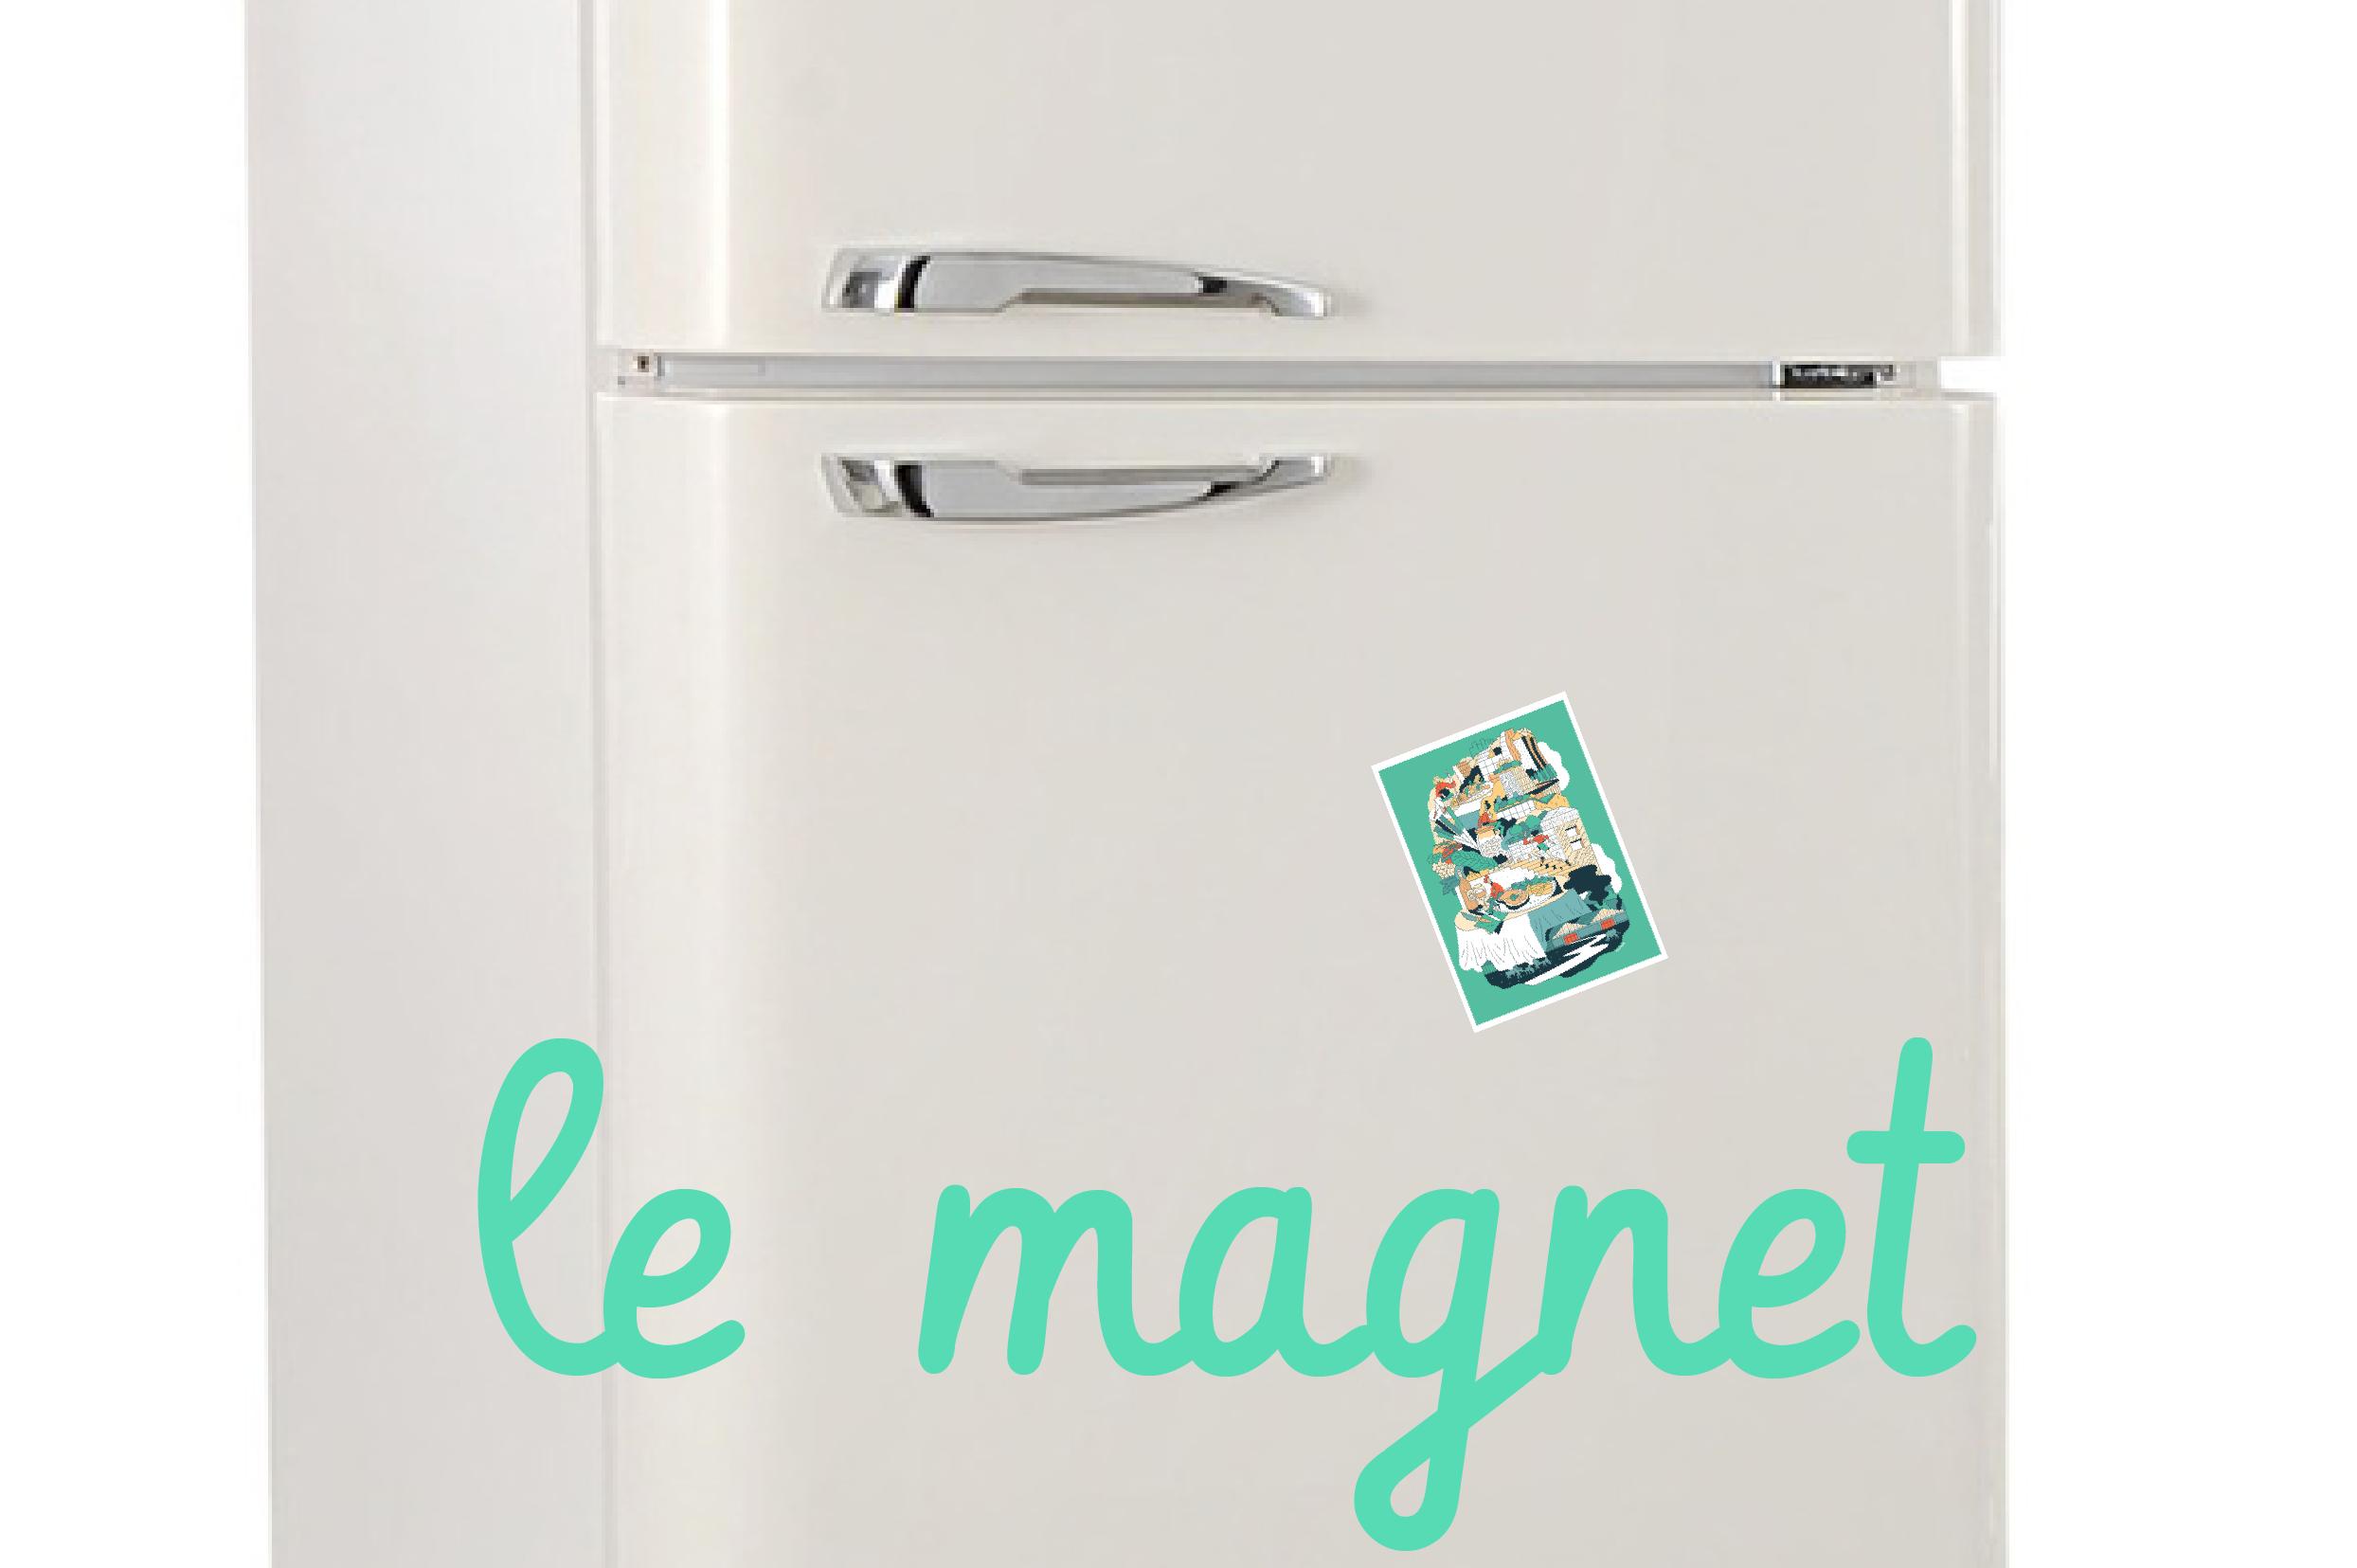 Magnet-01-1510669962.png